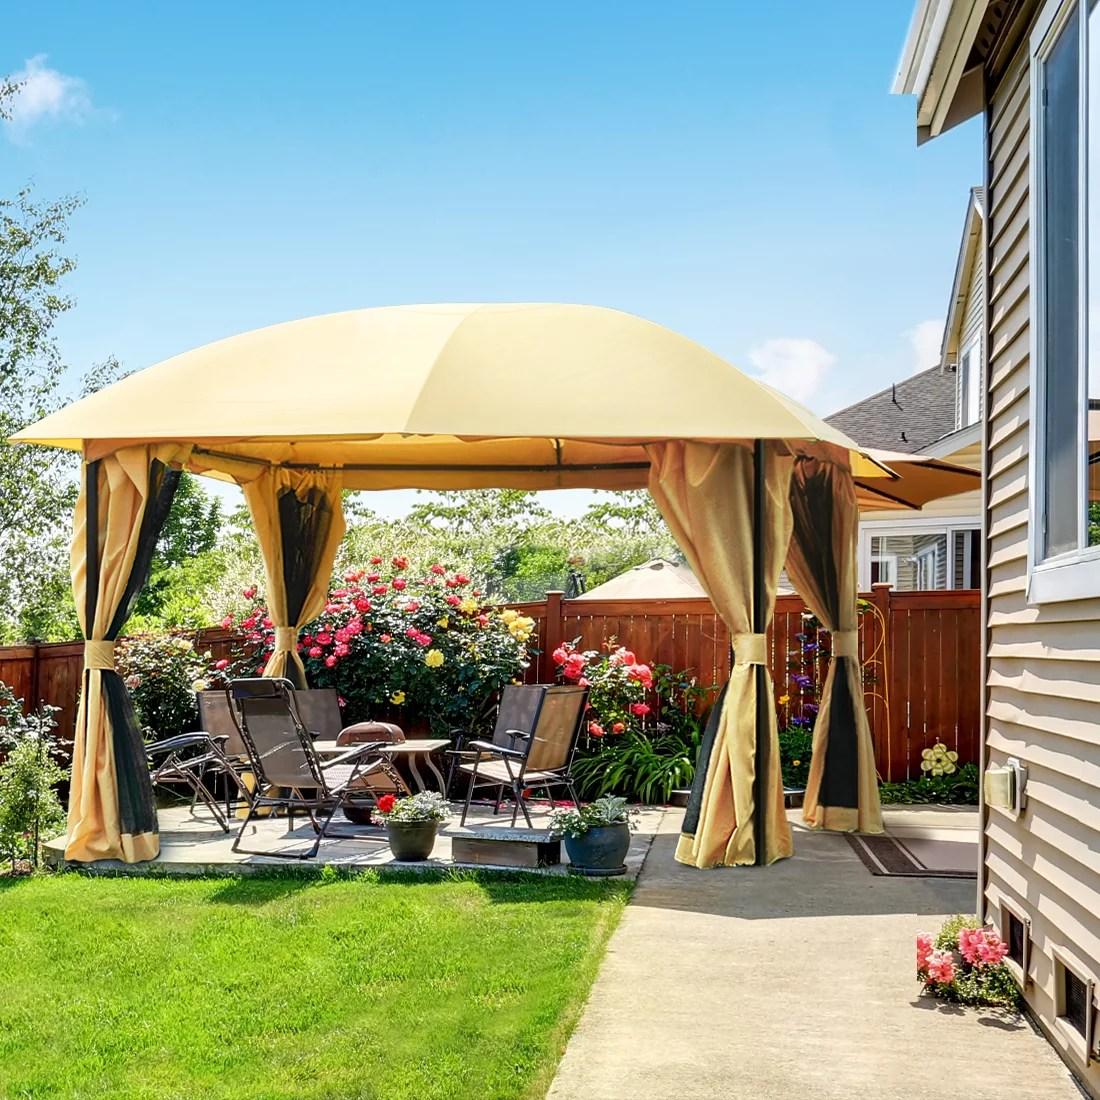 quictent 12x12 metal gazebo with mosquito netting sides screened gazebo canopy pergola for deck patio and backyard waterproof tan tan